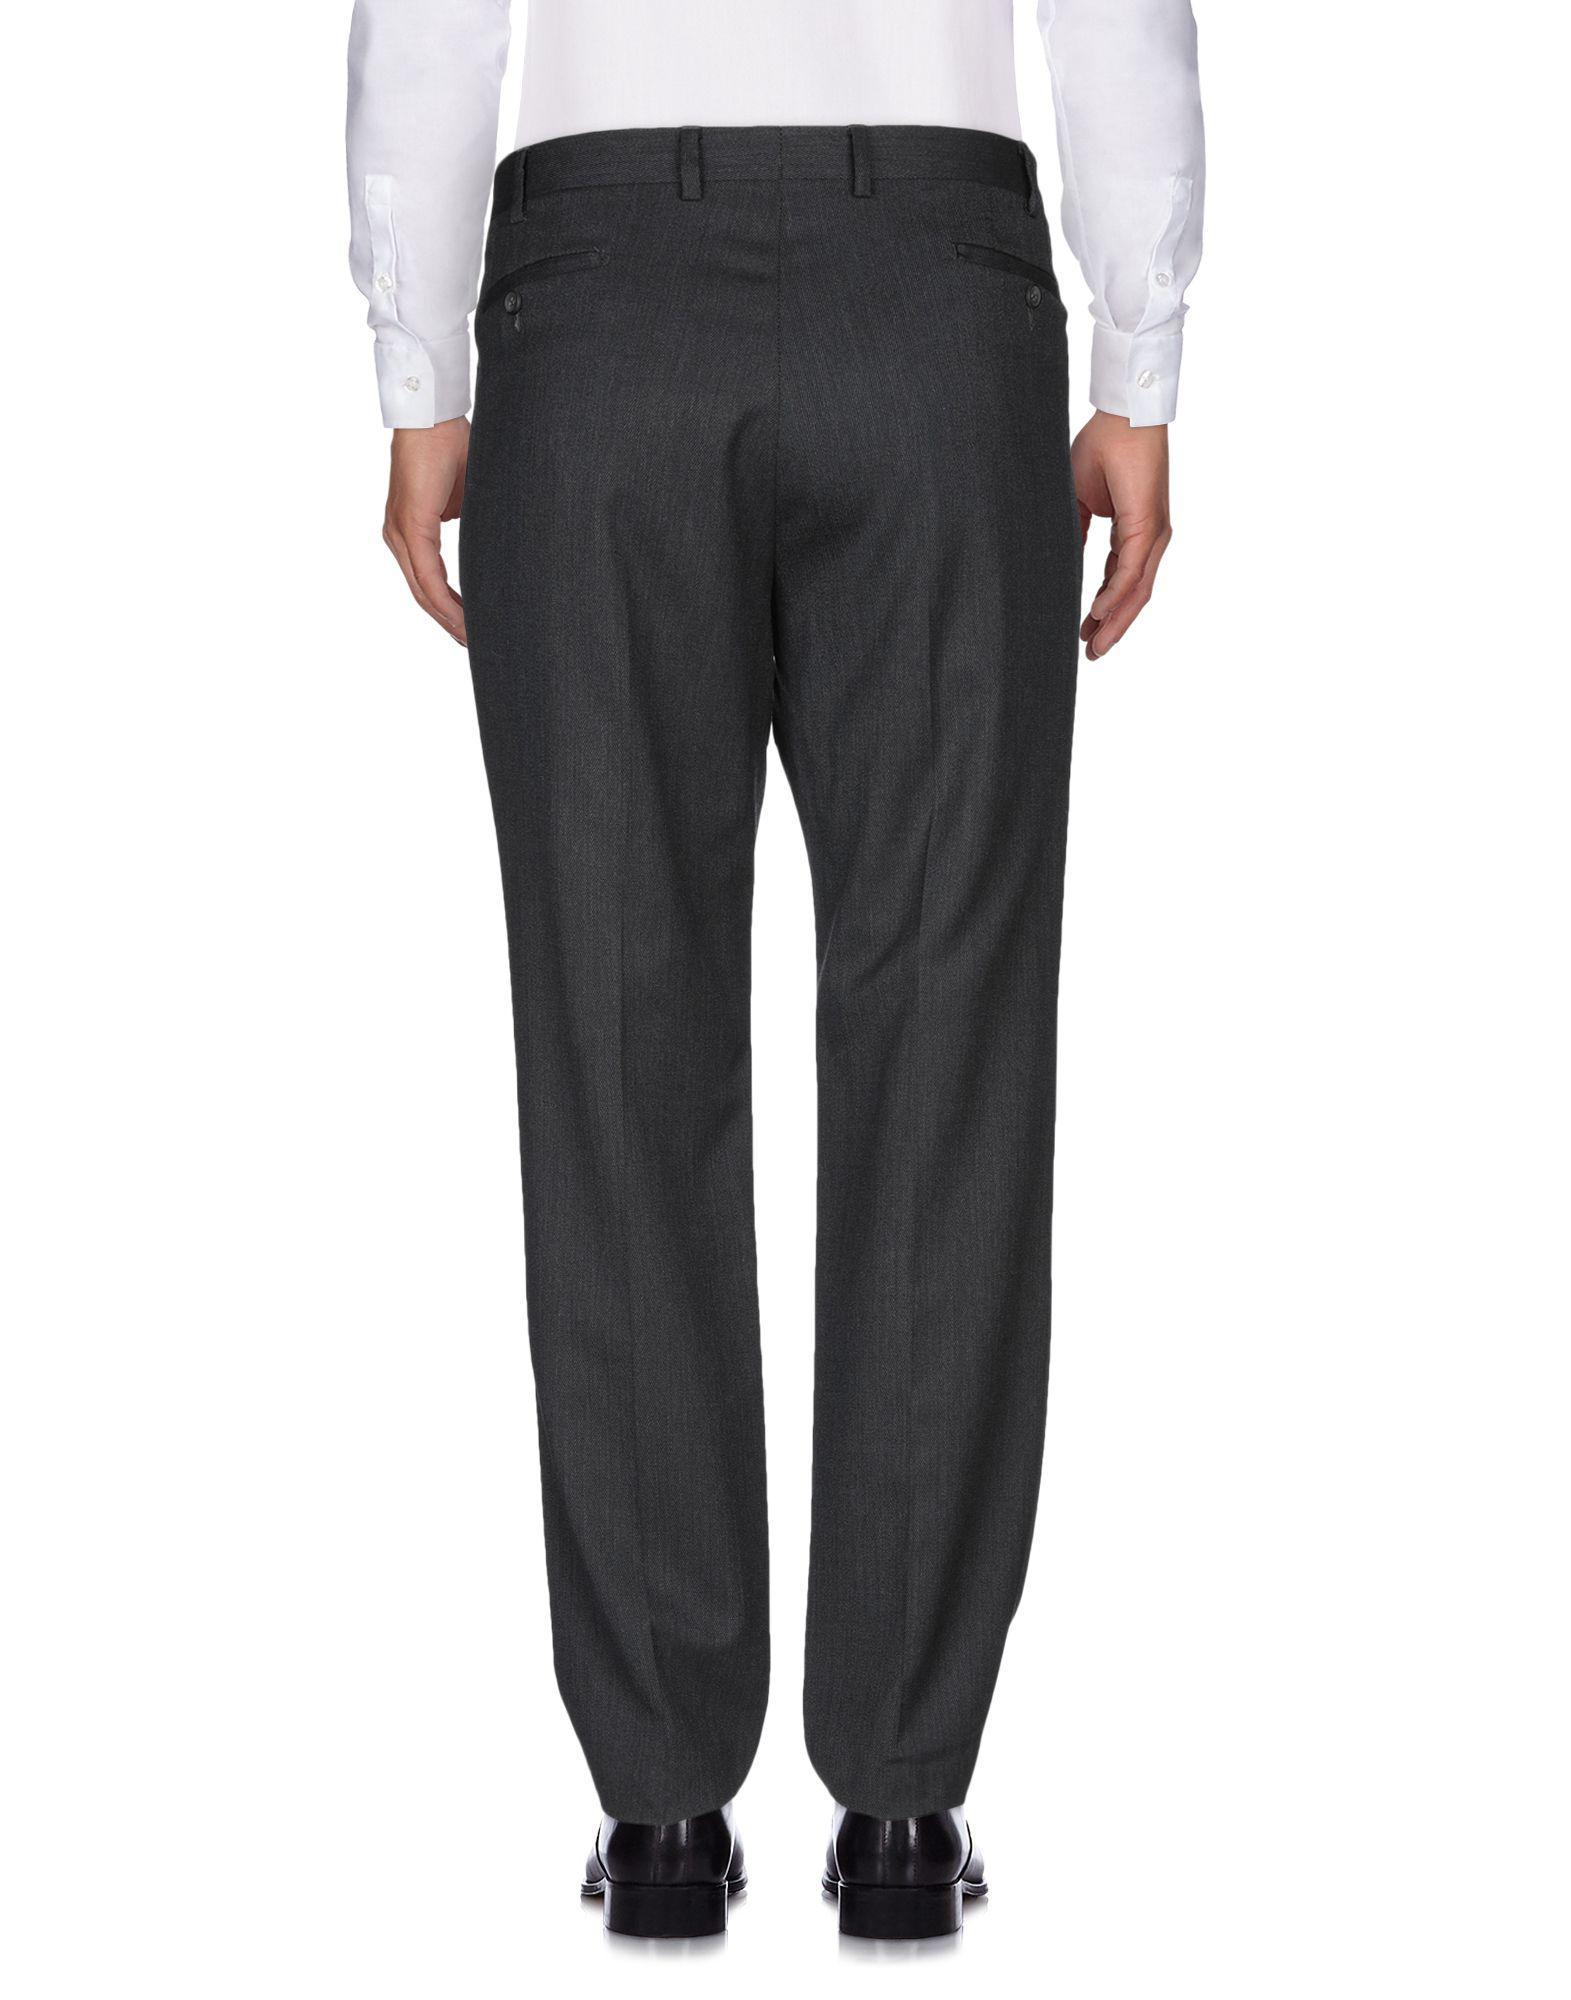 F E L L A. Wool Casual Pants in Steel Grey (Grey) for Men